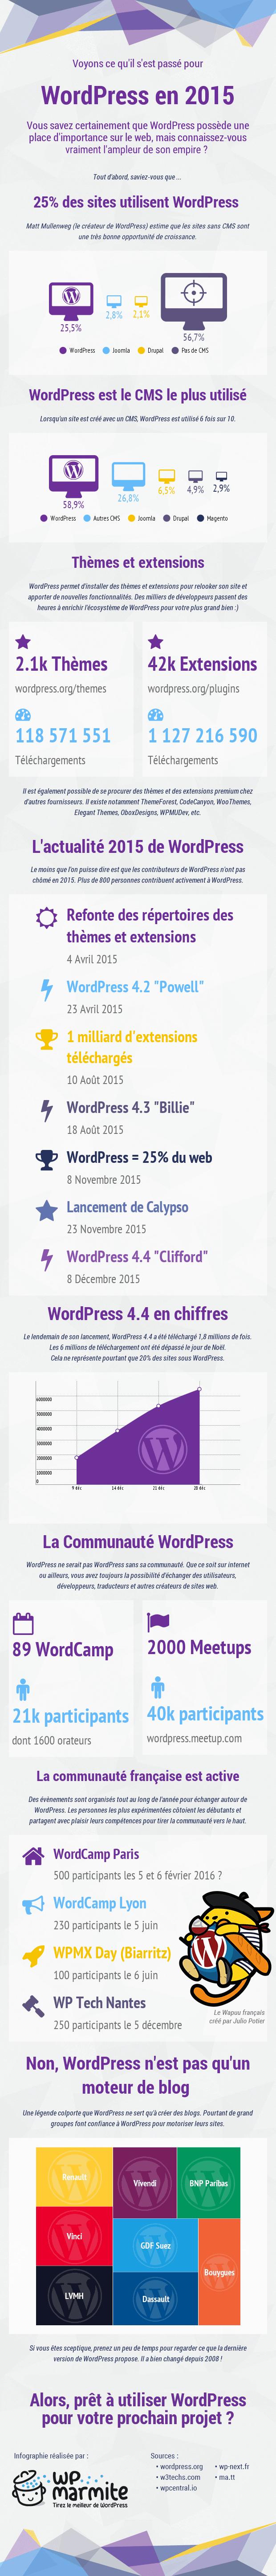 Infographie WordPress 2015 par WP Marmite